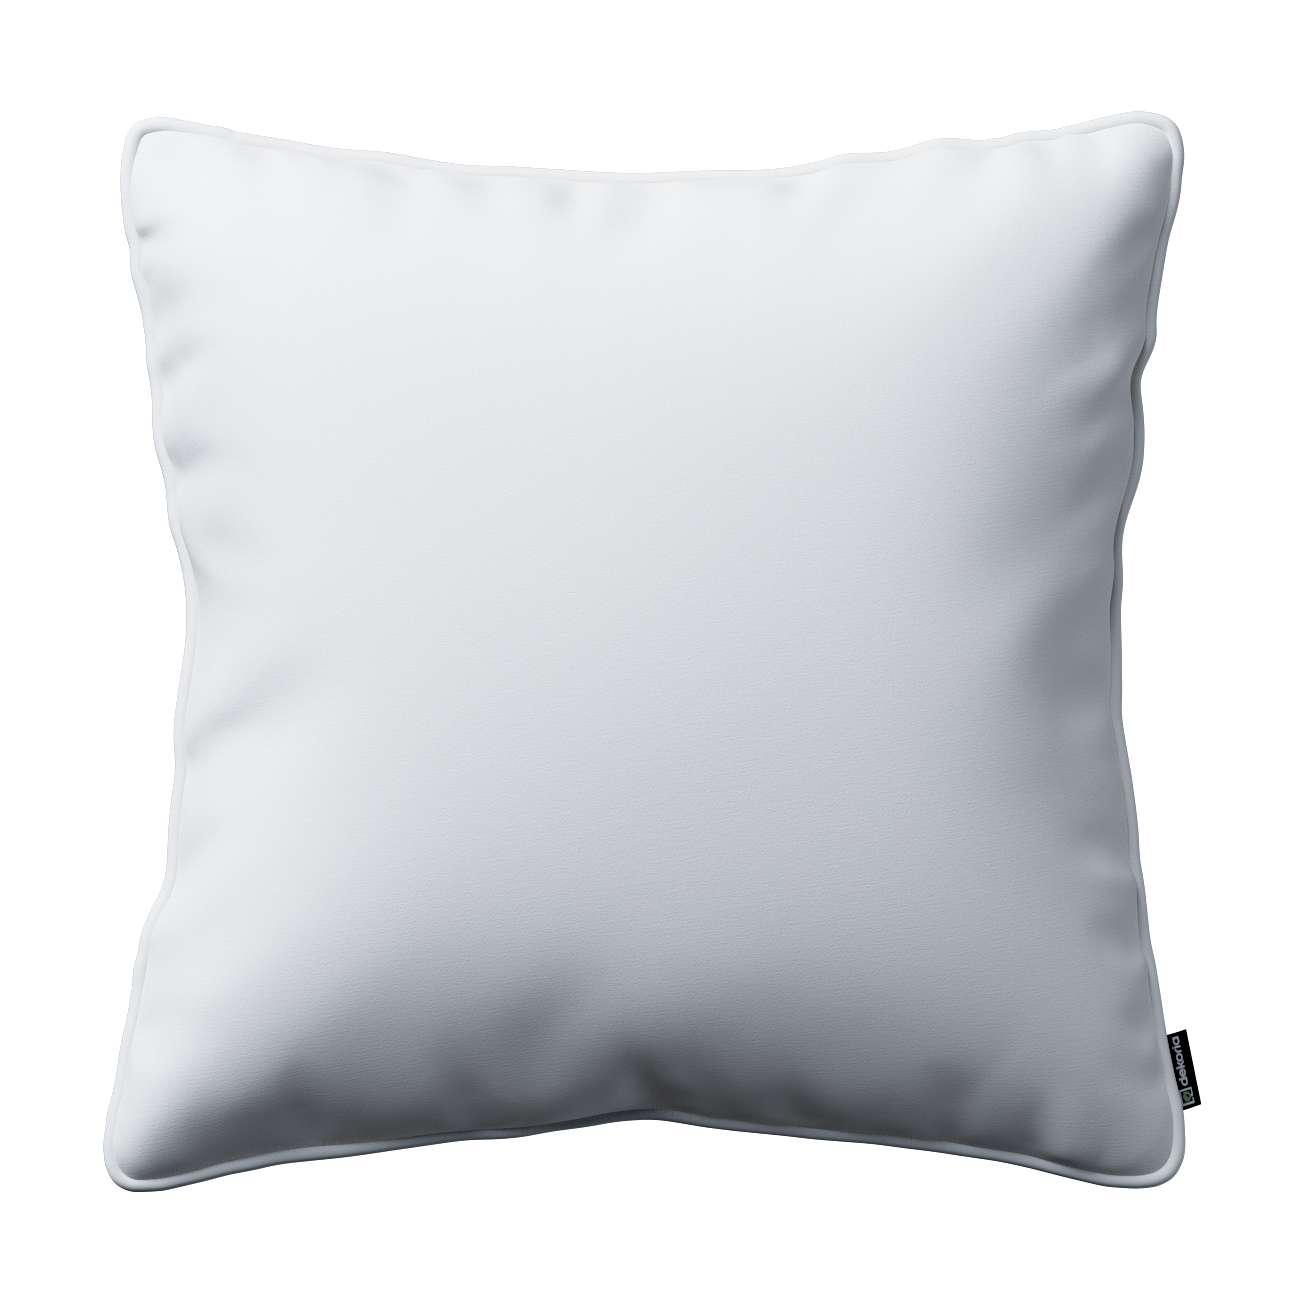 Poszewka Gabi na poduszkę 45 x 45 cm w kolekcji Comics, tkanina: 139-00